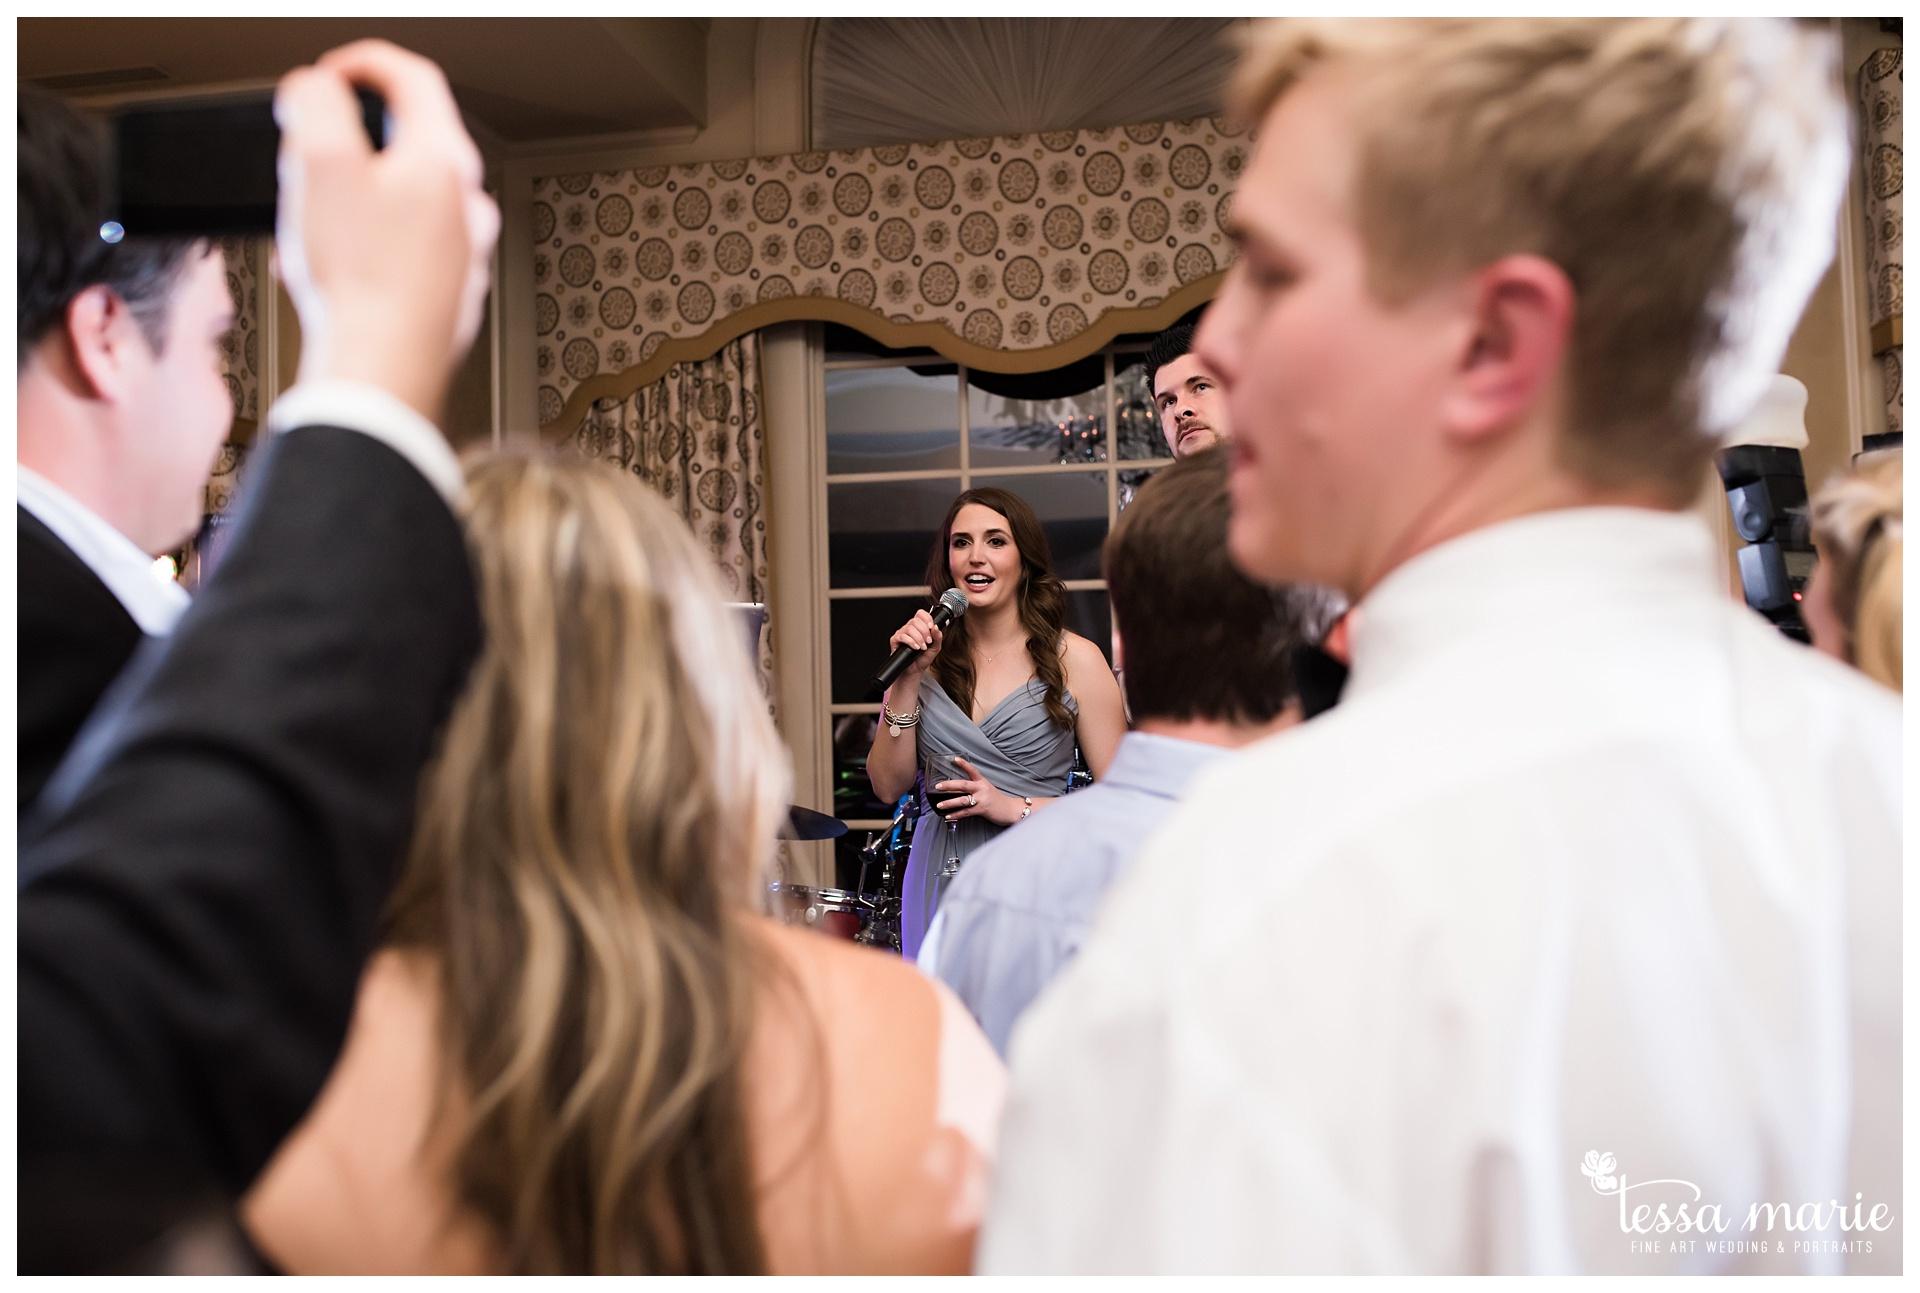 tessa_marie_weddings_legacy_story_focused_wedding_pictures_atlanta_wedding_photographer_0158